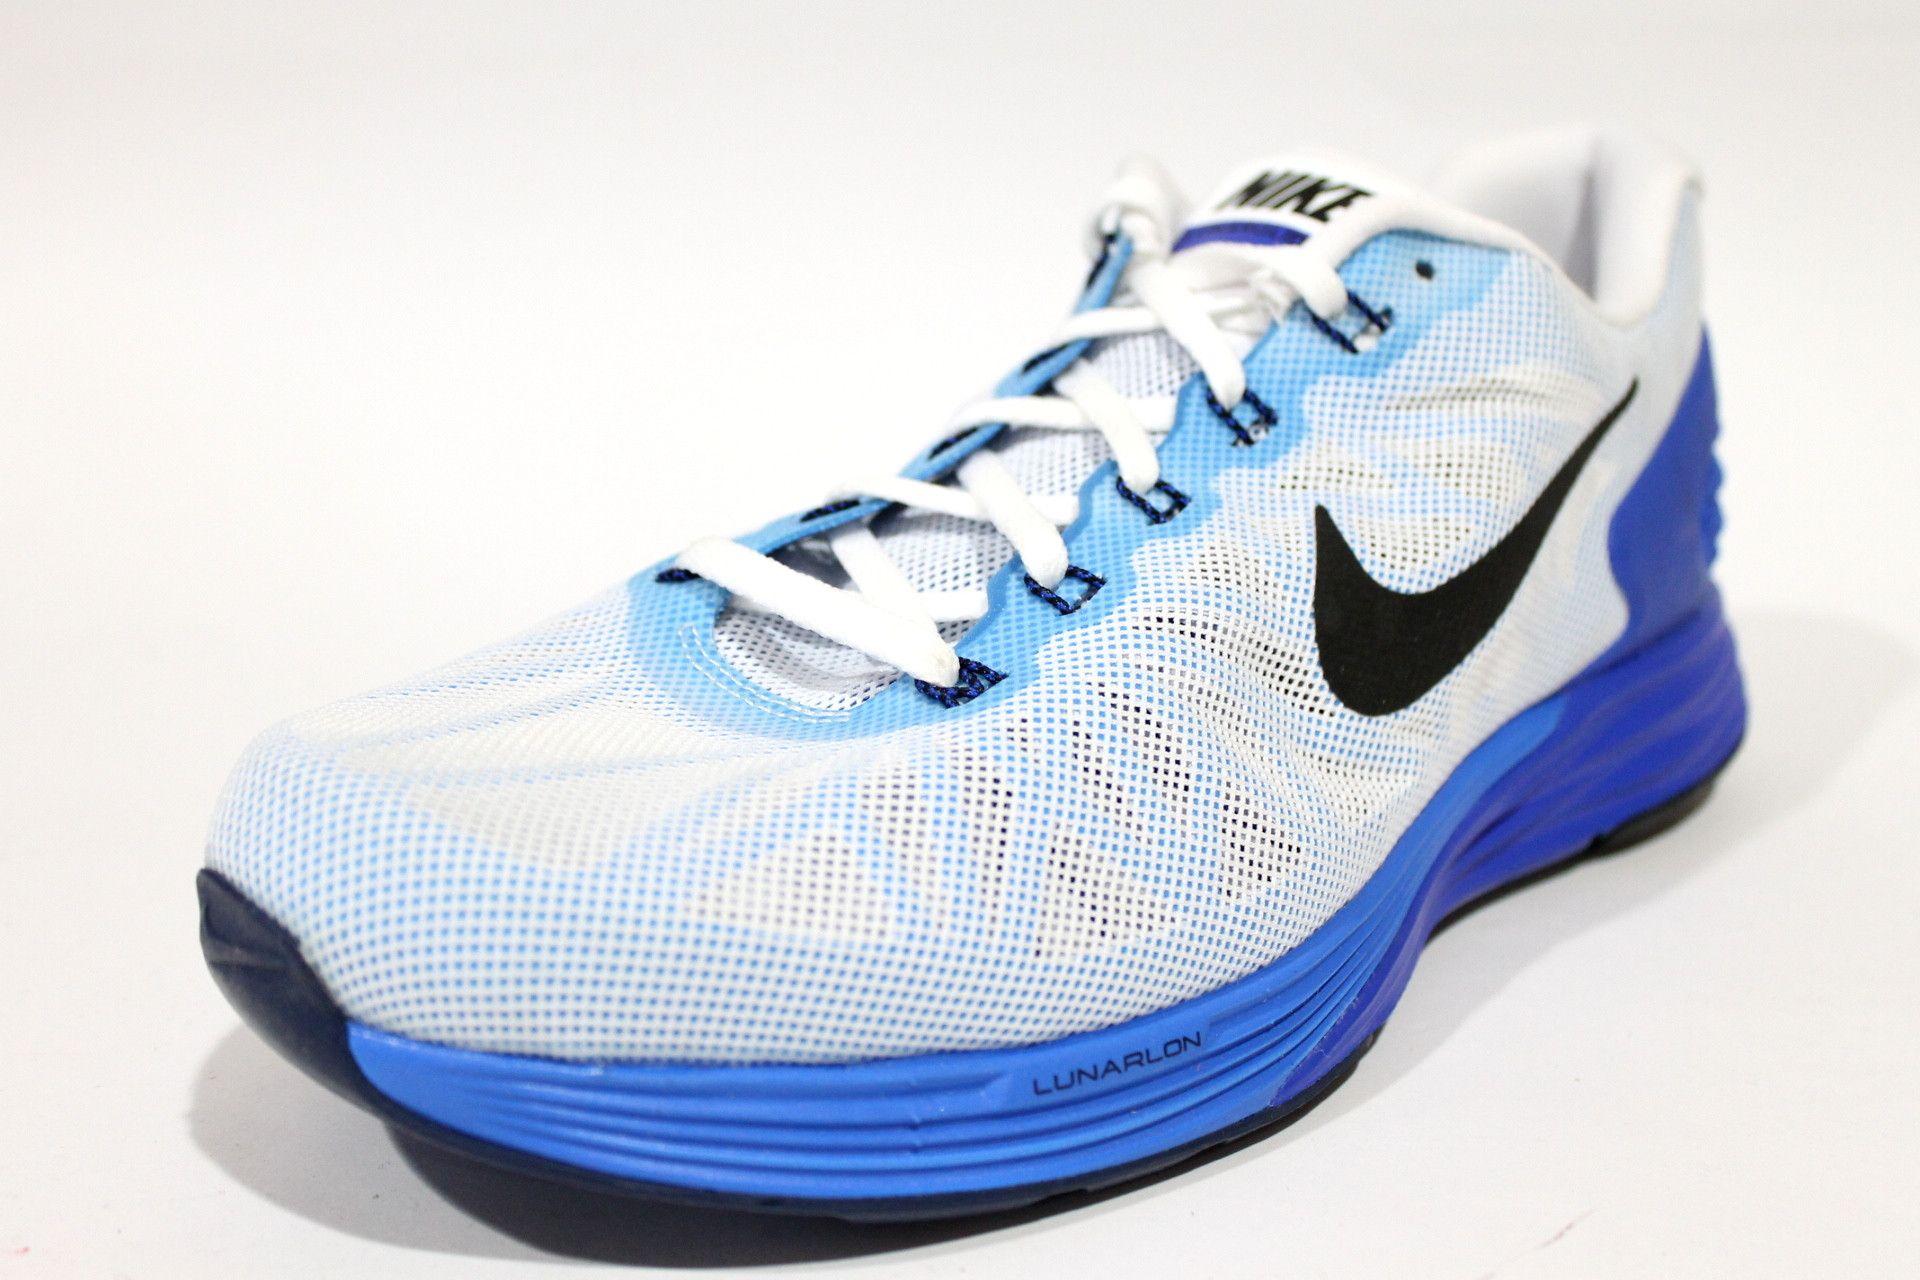 separation shoes f9989 d1241 Nike Men s Lunarglide 6 White Lyon Blue Running Shoes 654433 104